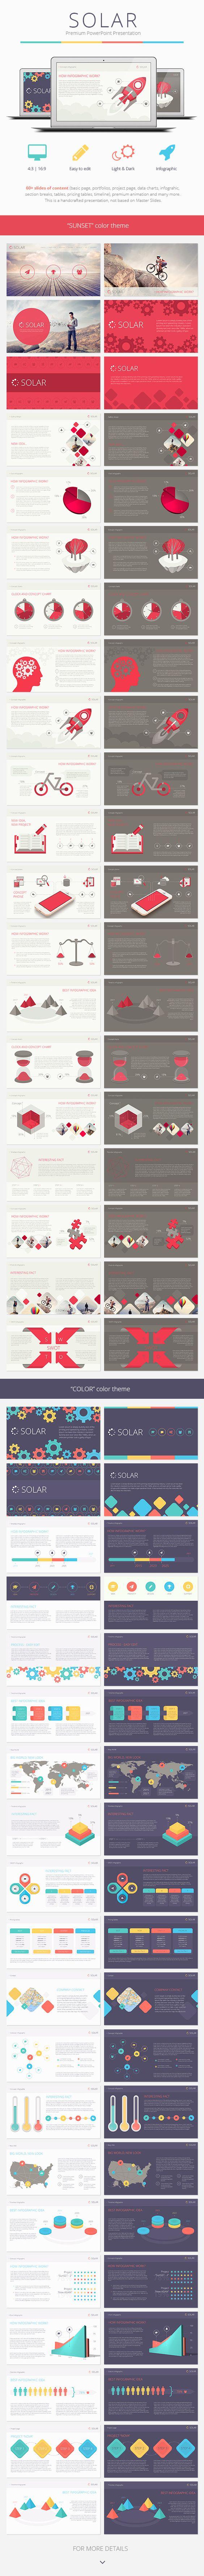 Solar PowerPoint Presentation Template PowerPoint Template / Theme / Presentation / Slides / Background / Power Point #powerpoint #template #theme